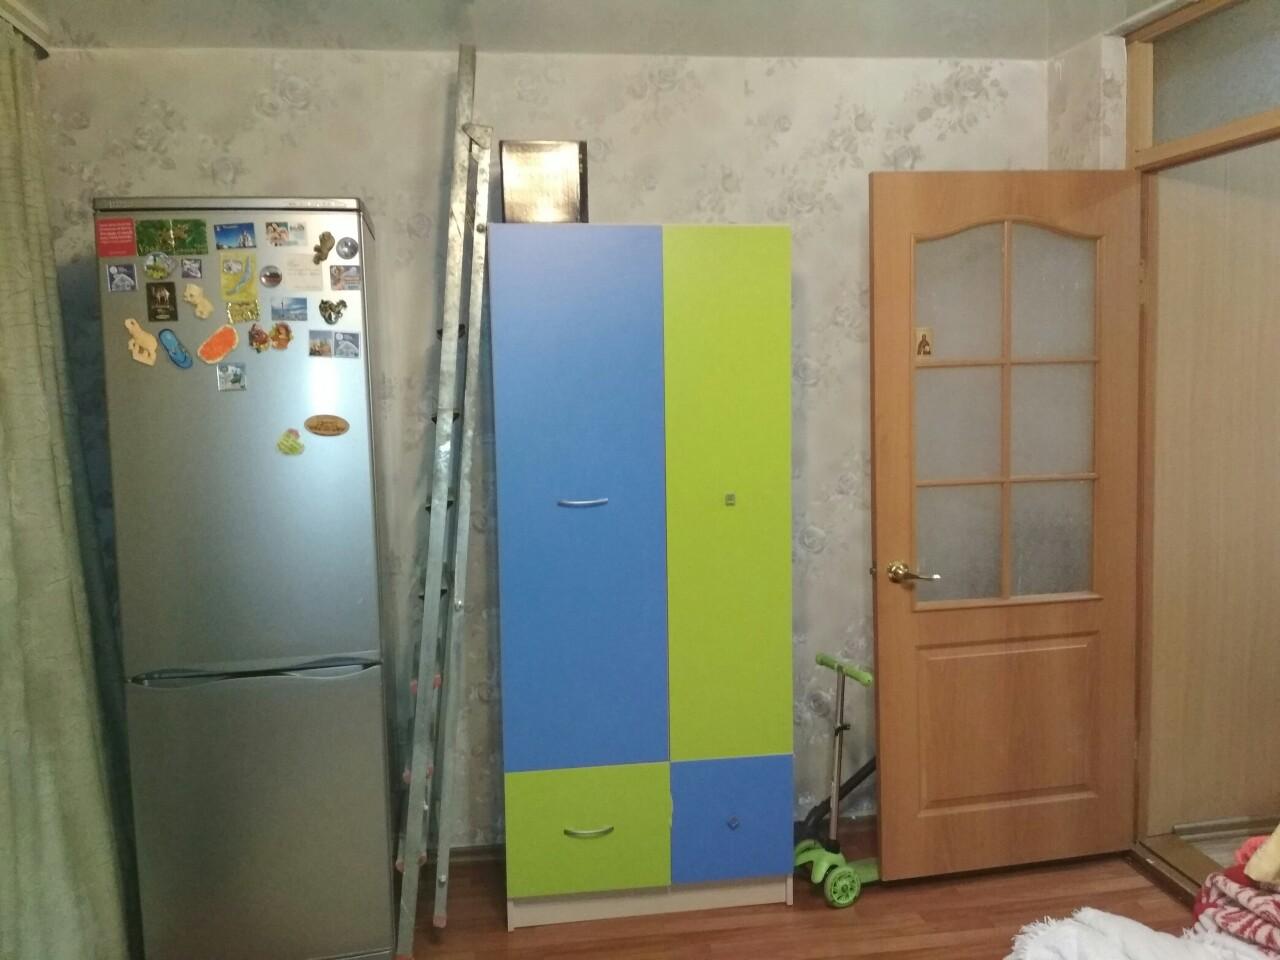 Продается трехкомнатная квартира за 2 220 000 рублей. г Улан-Удэ, ул Комсомольская, д 28.